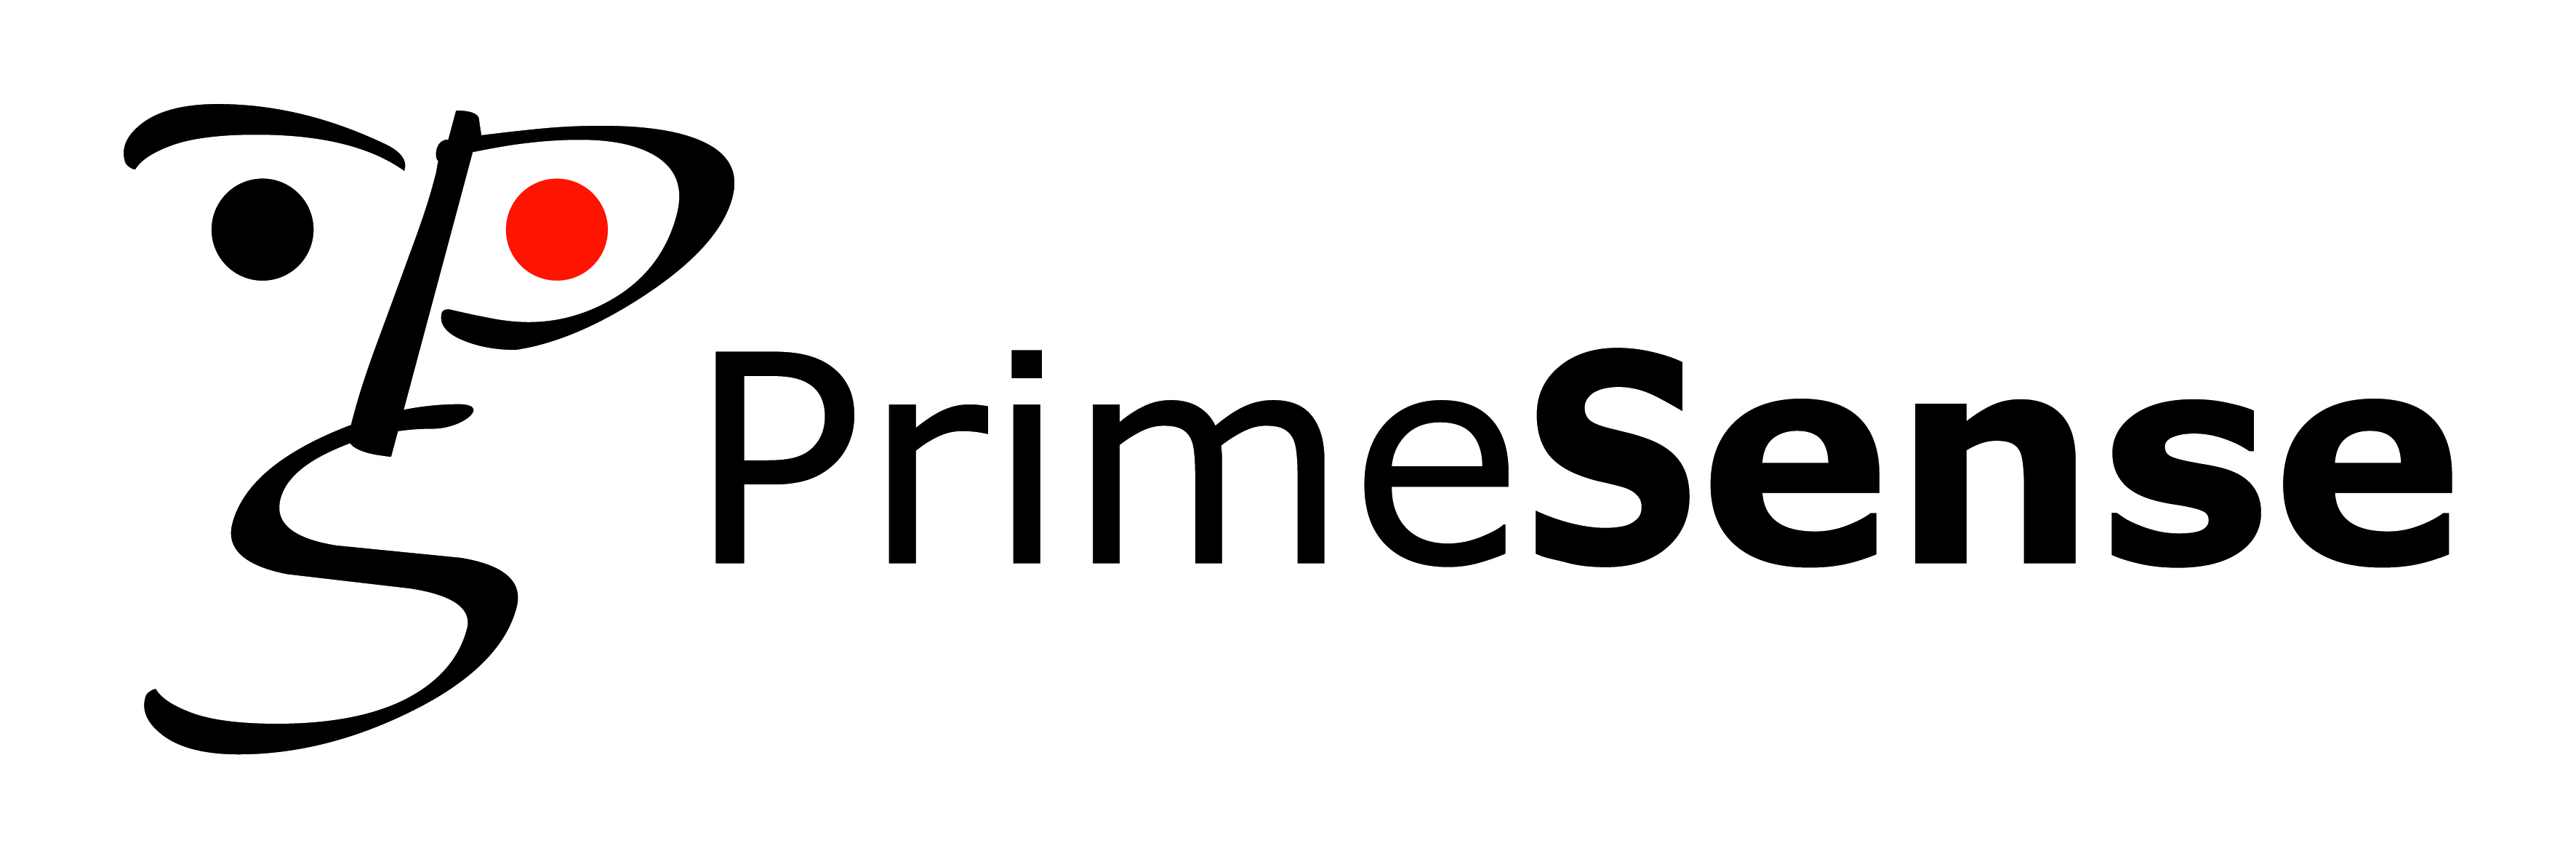 Apple купила PrimeSense за $350 миллионов